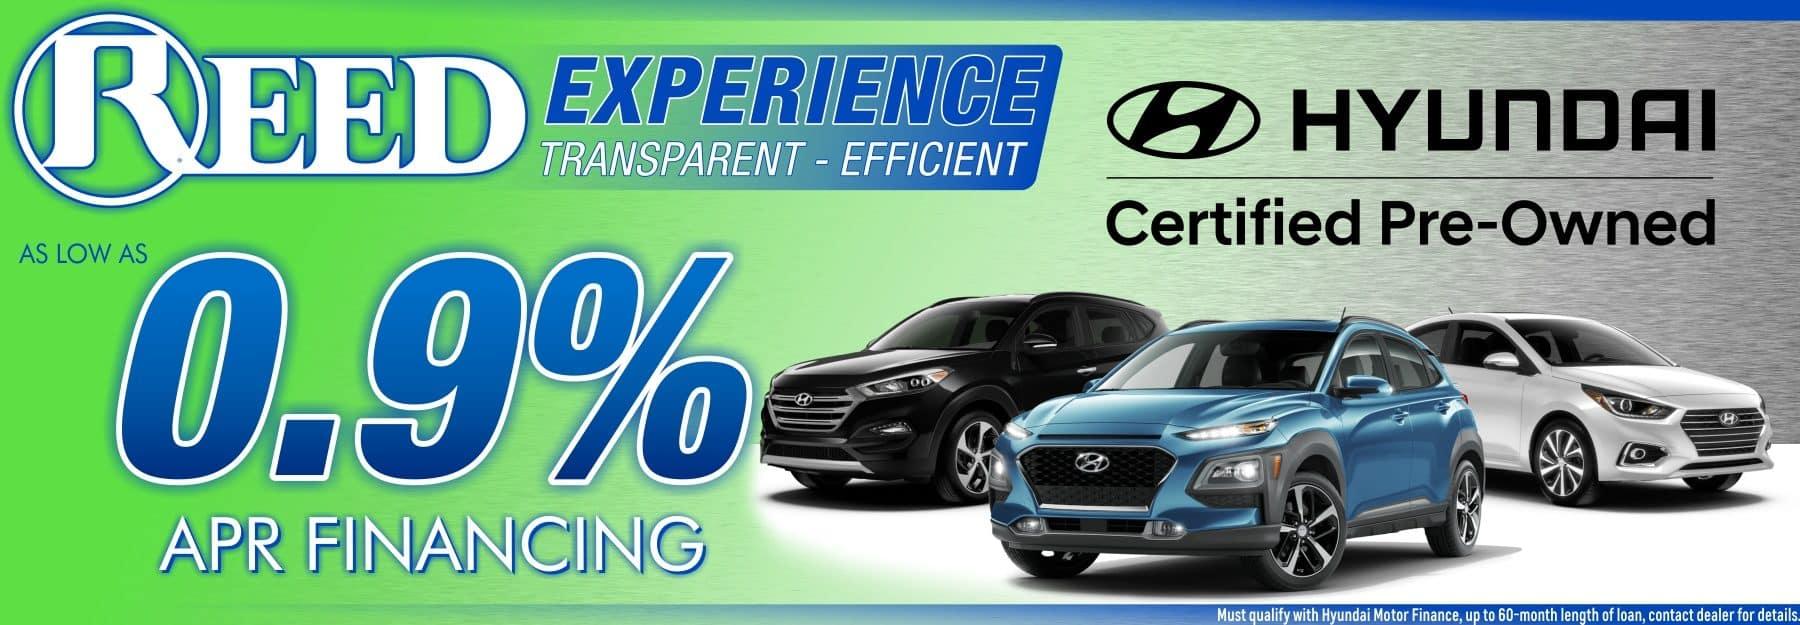 Hyundai KC ads JUNE 2021 cpo web